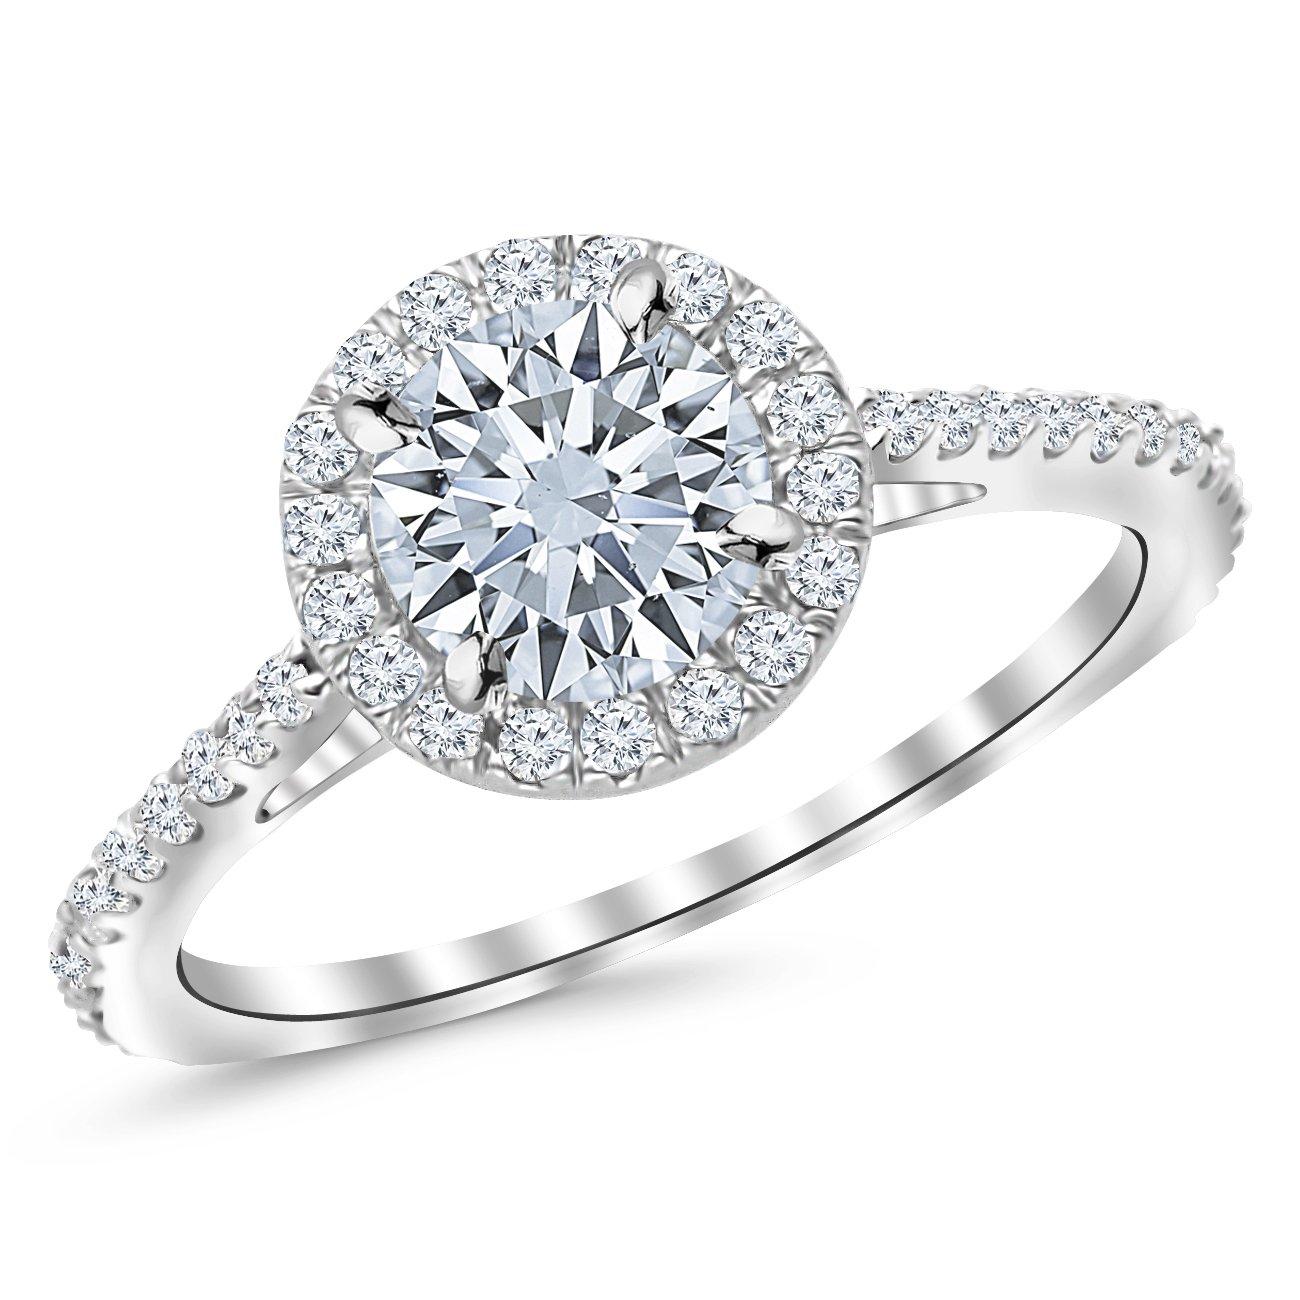 0.85 Carat Classic Halo Diamond Engagement Ring 14K White Gold with a 0.45 Carat I-J I1 Round Brilliant Cut/Shape